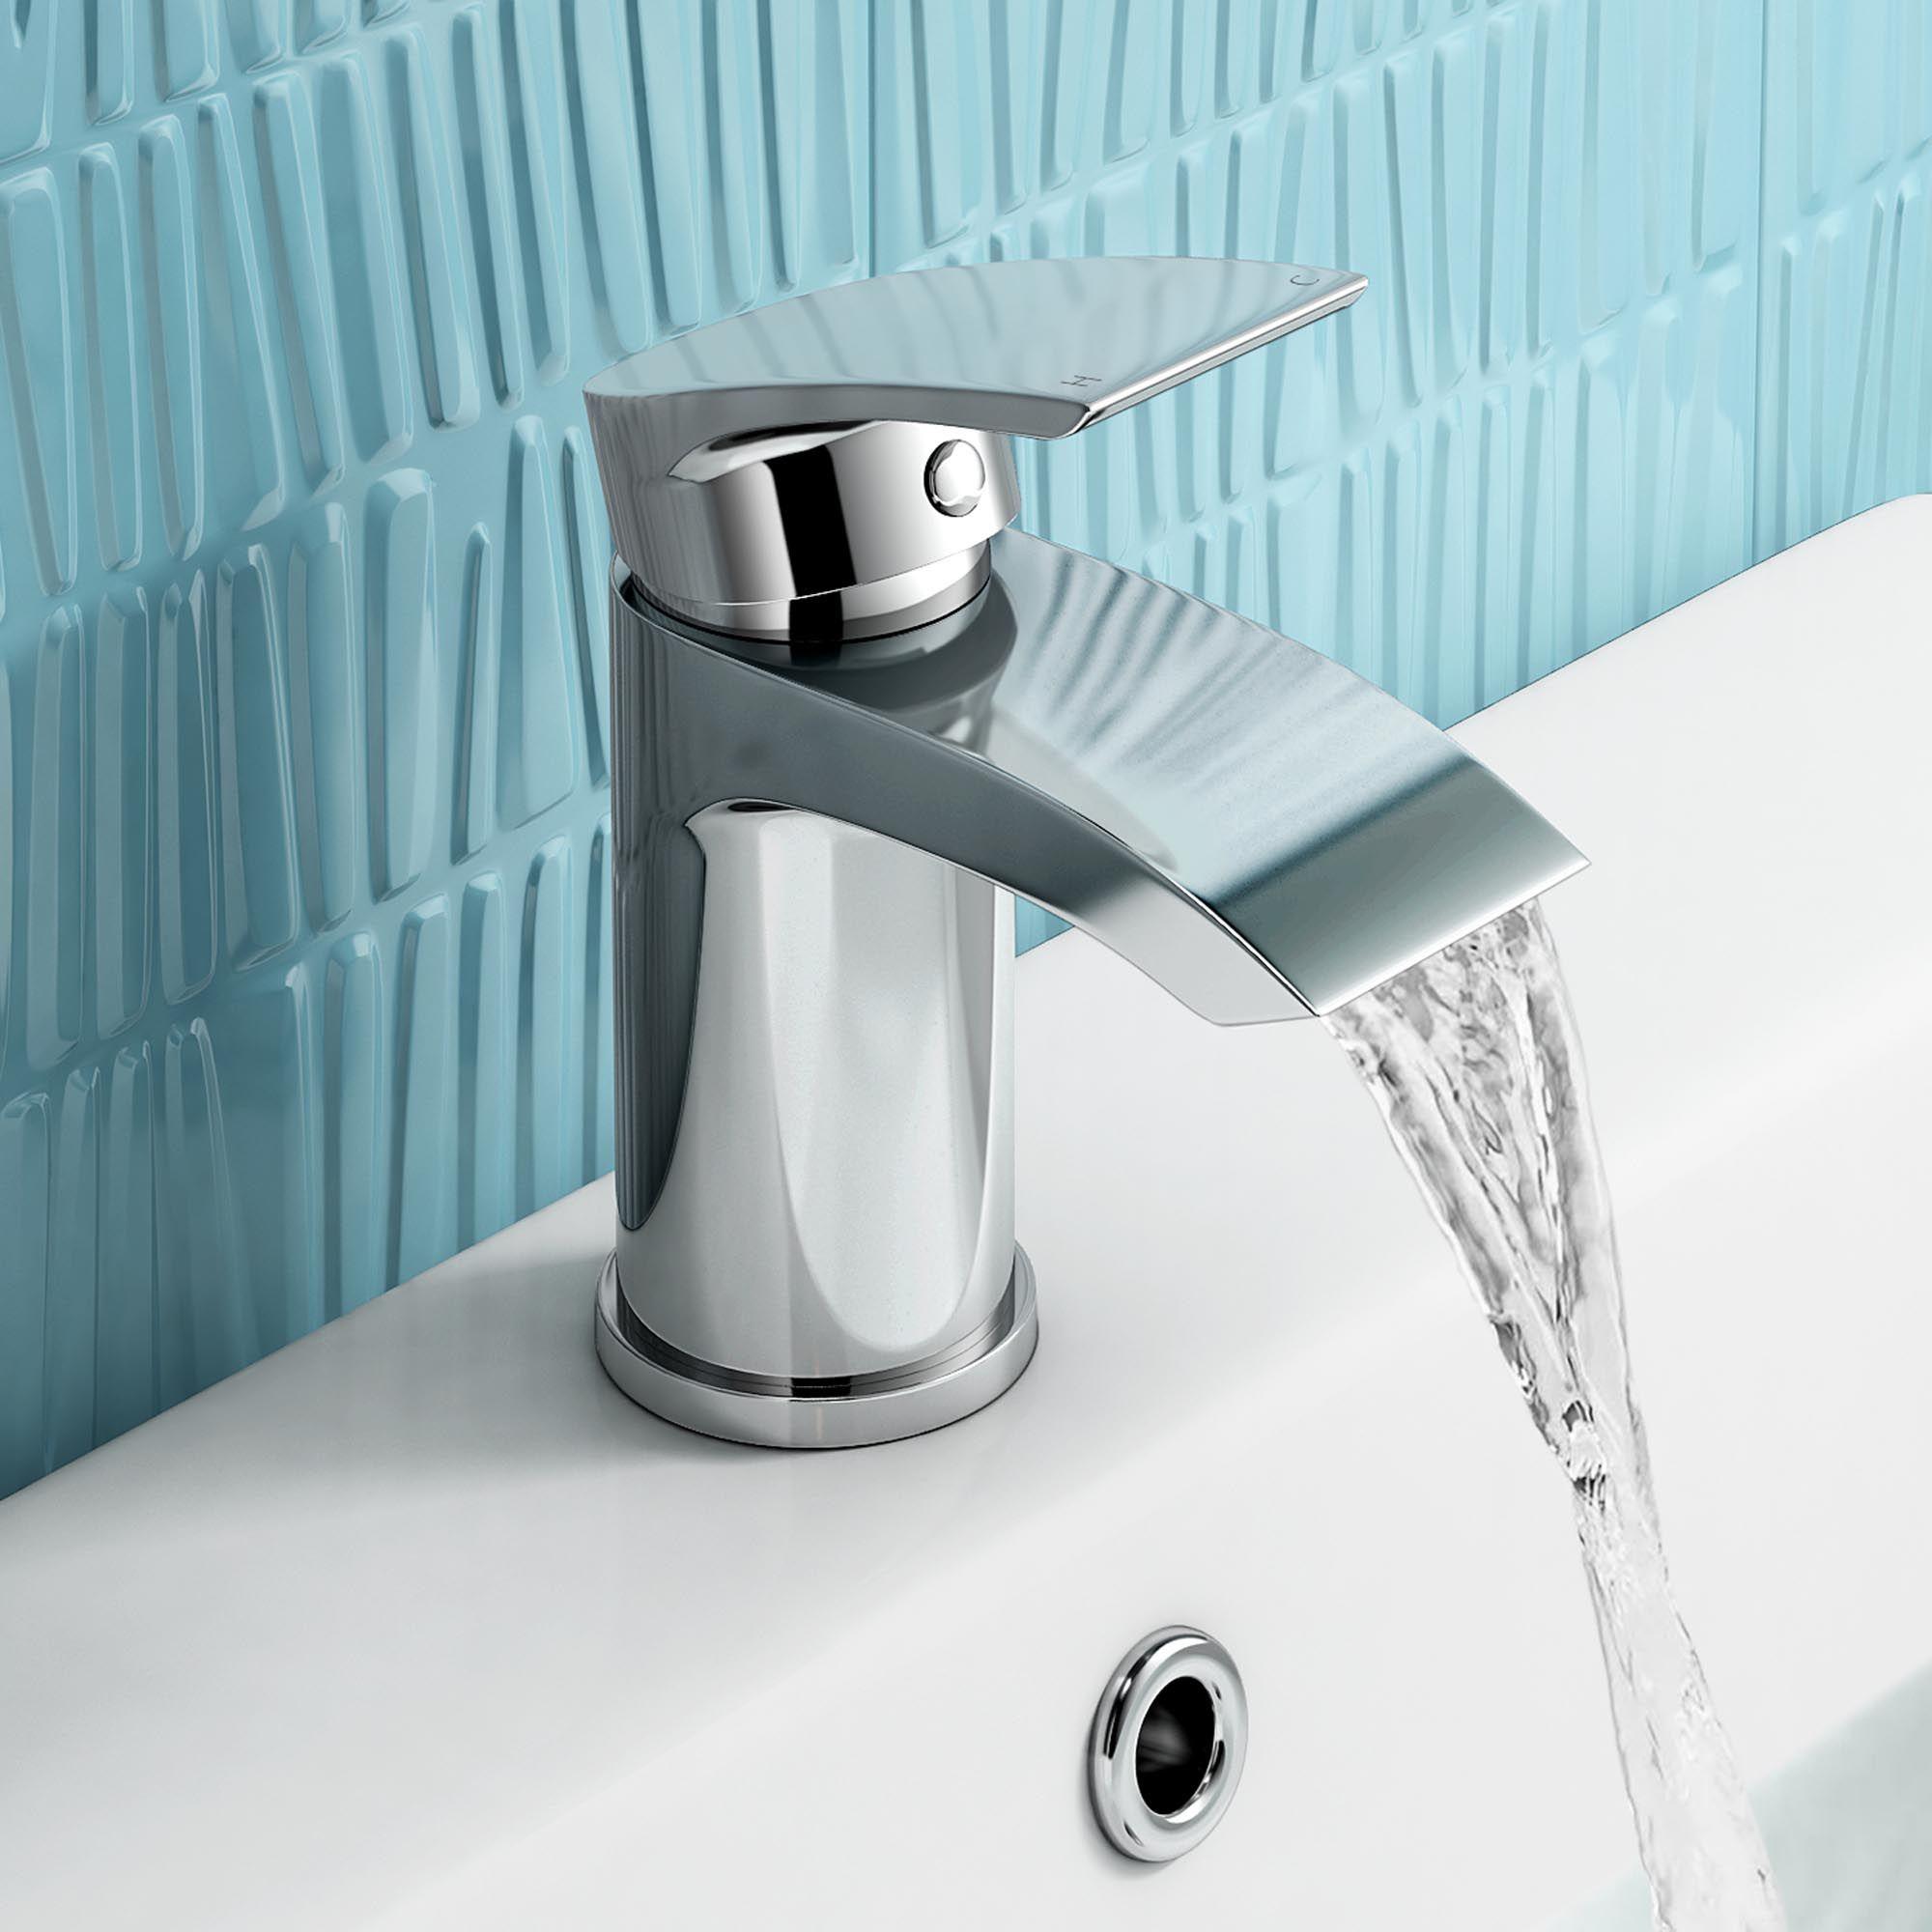 Nelas Cloakroom Basin Mixer Tap | Bathroom taps, Mixer taps and Taps